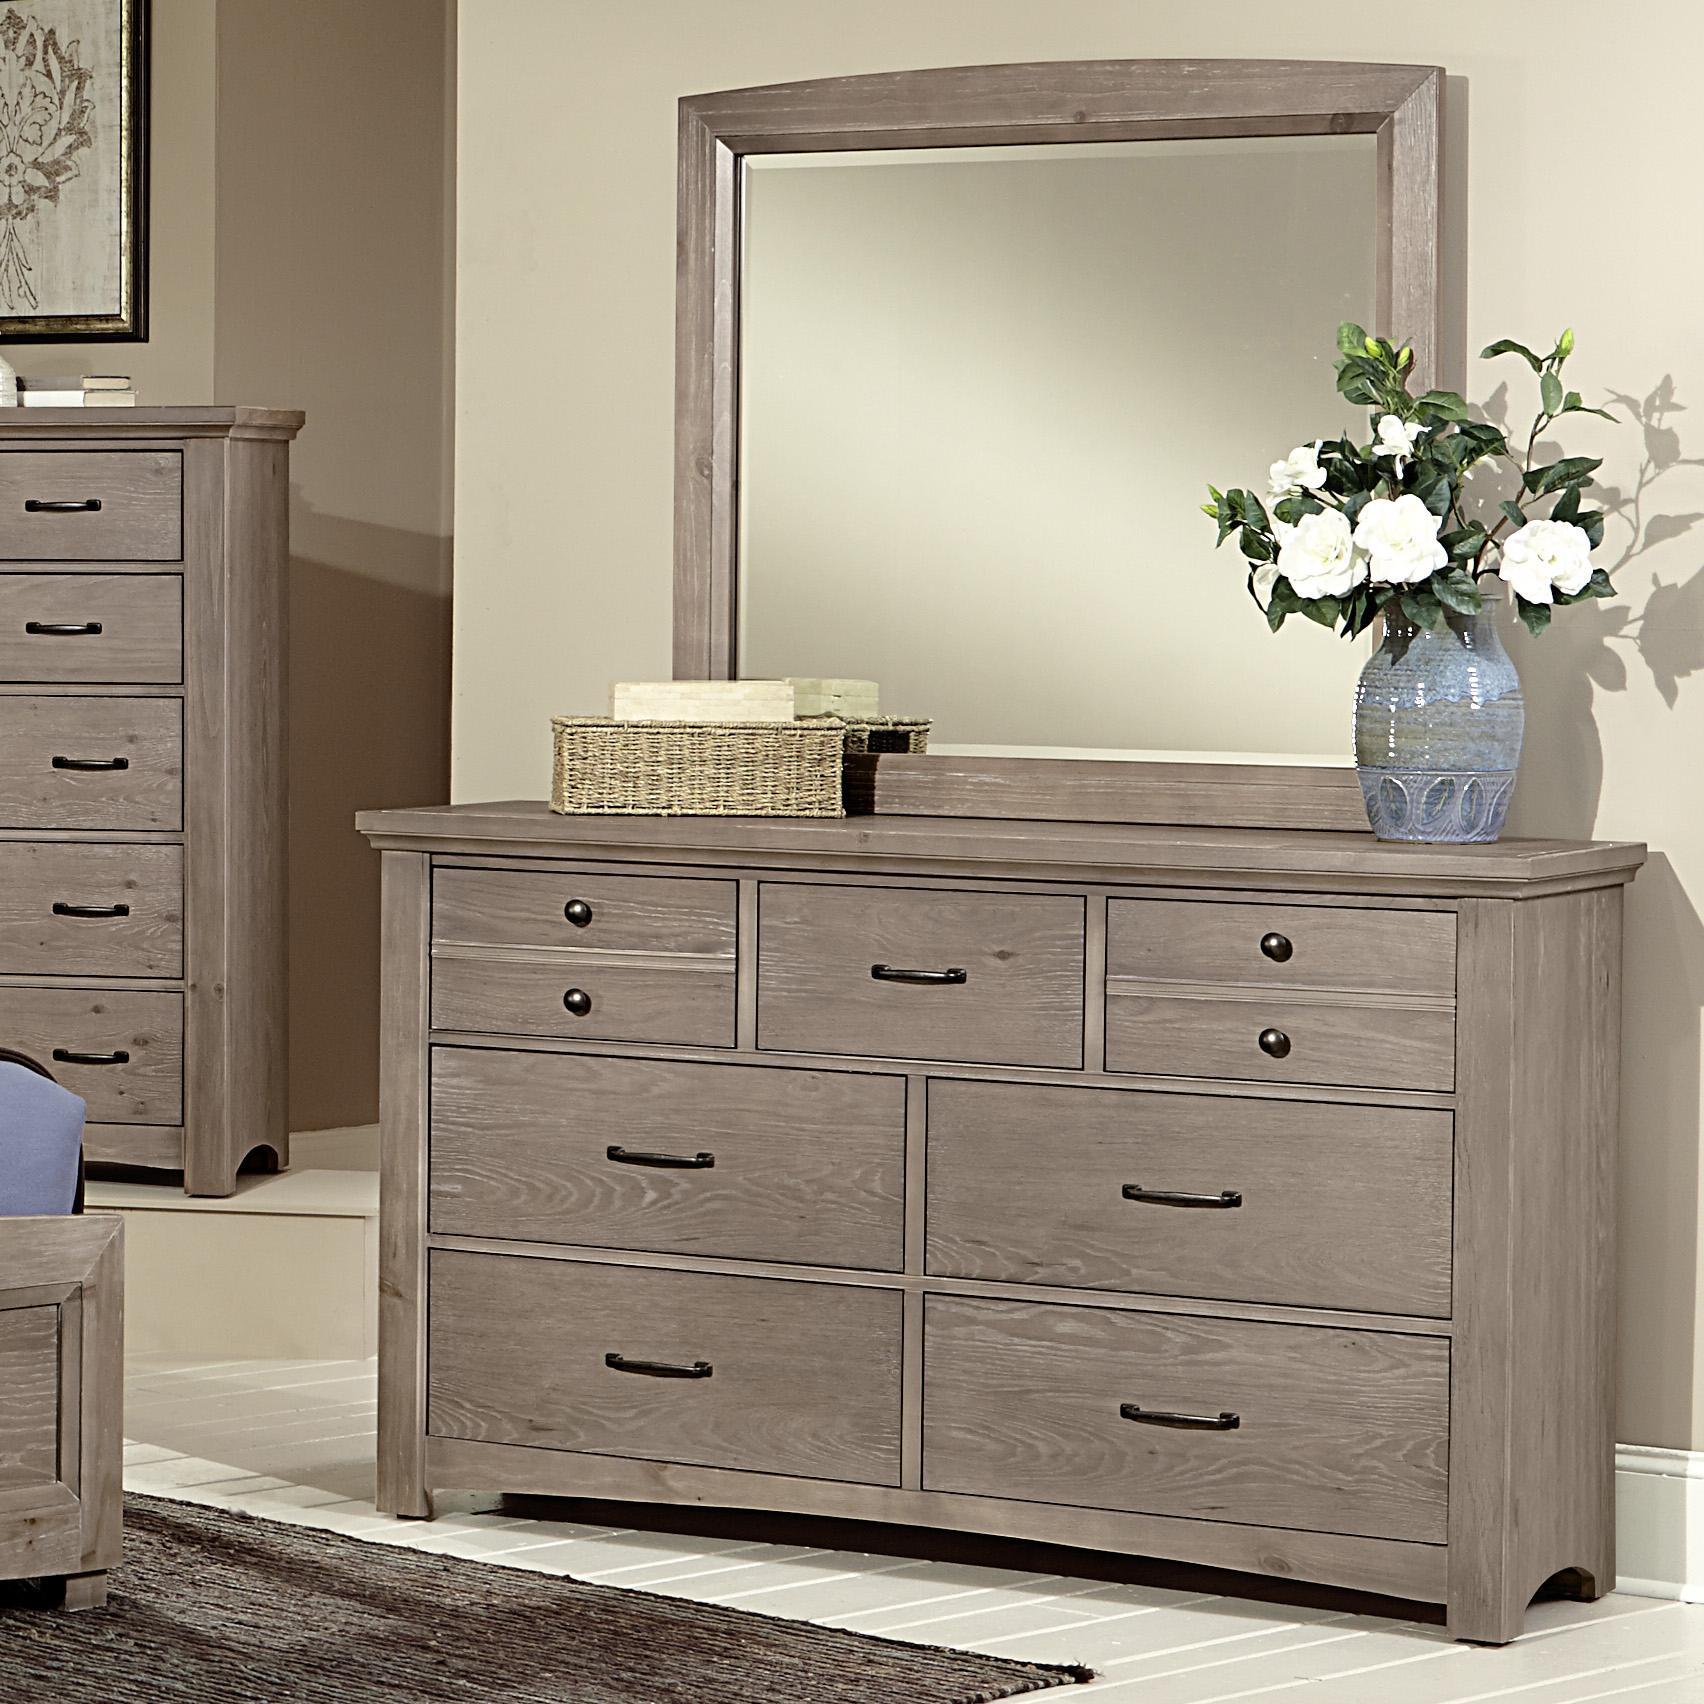 Vaughan Bassett Transitions Dresser & Landscape Mirror - Item Number: BB61-002+446